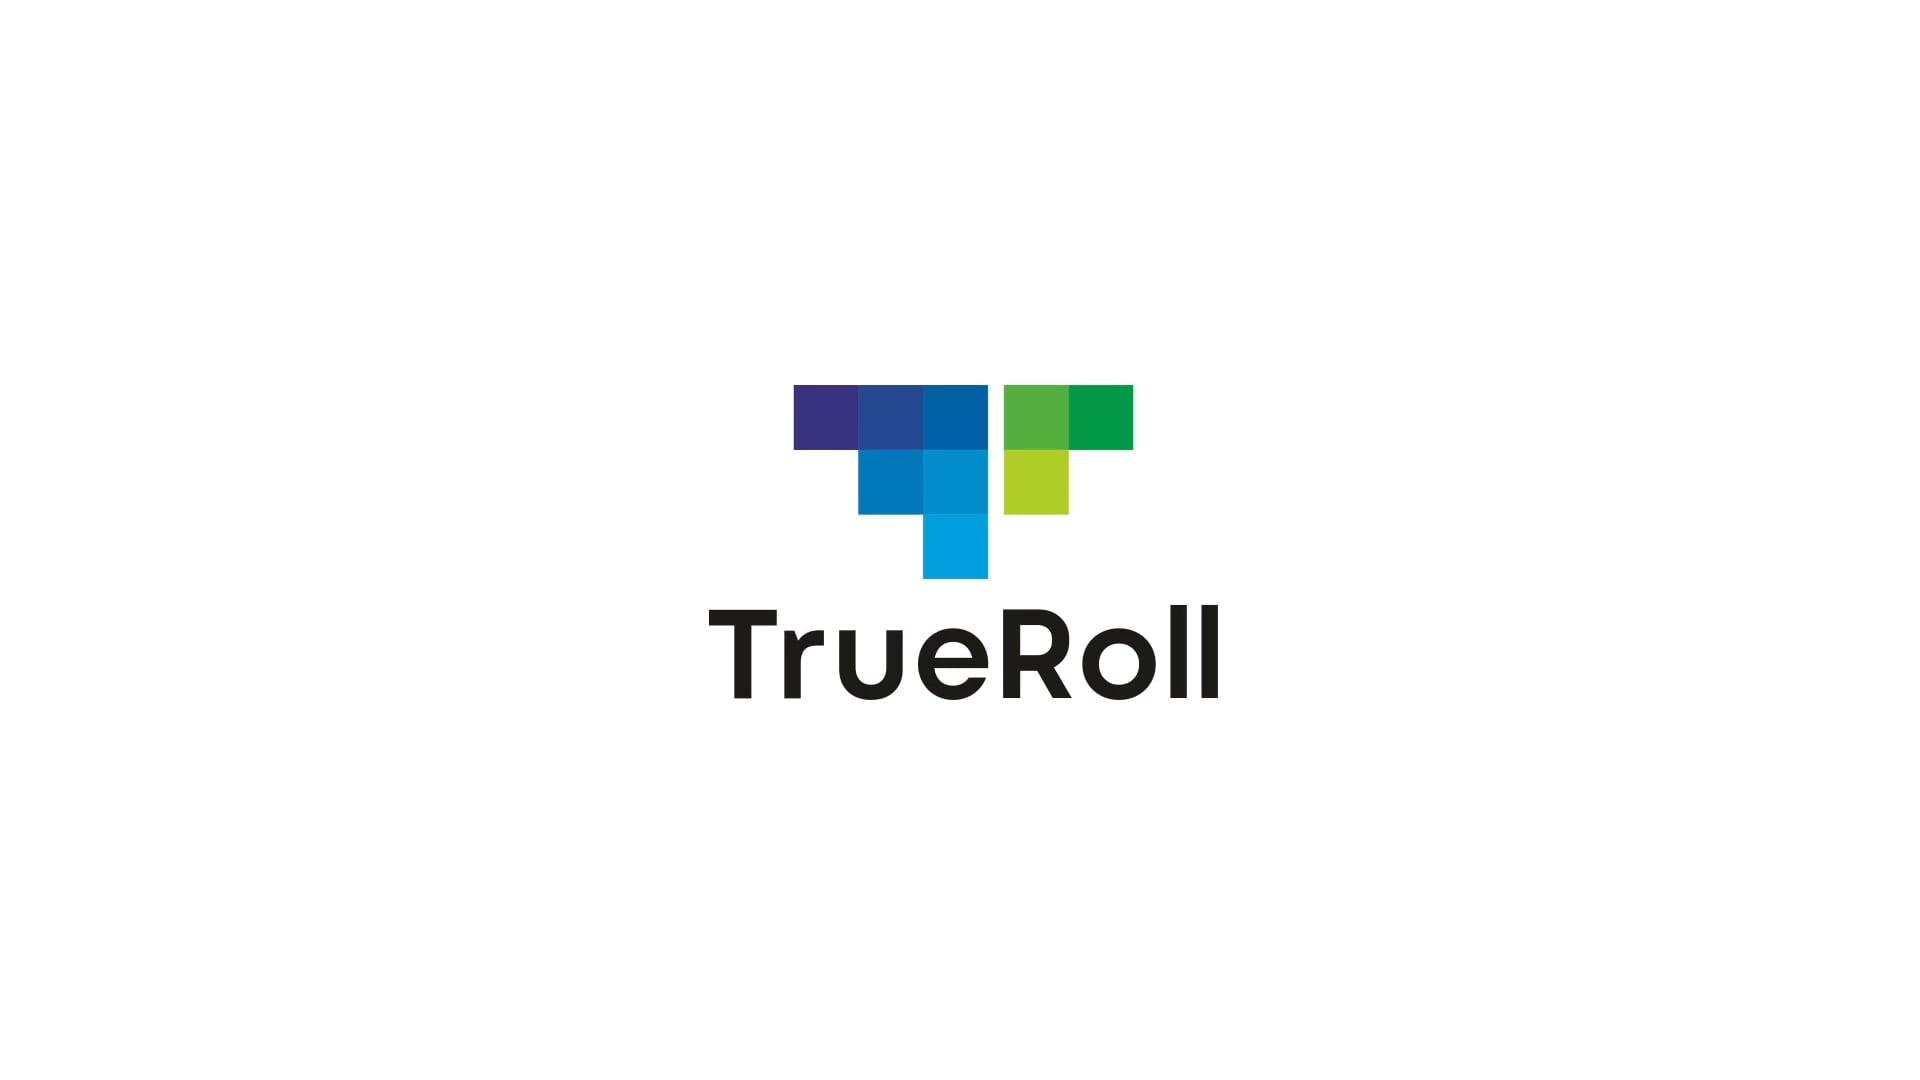 TrueRoll Is Easy To Use